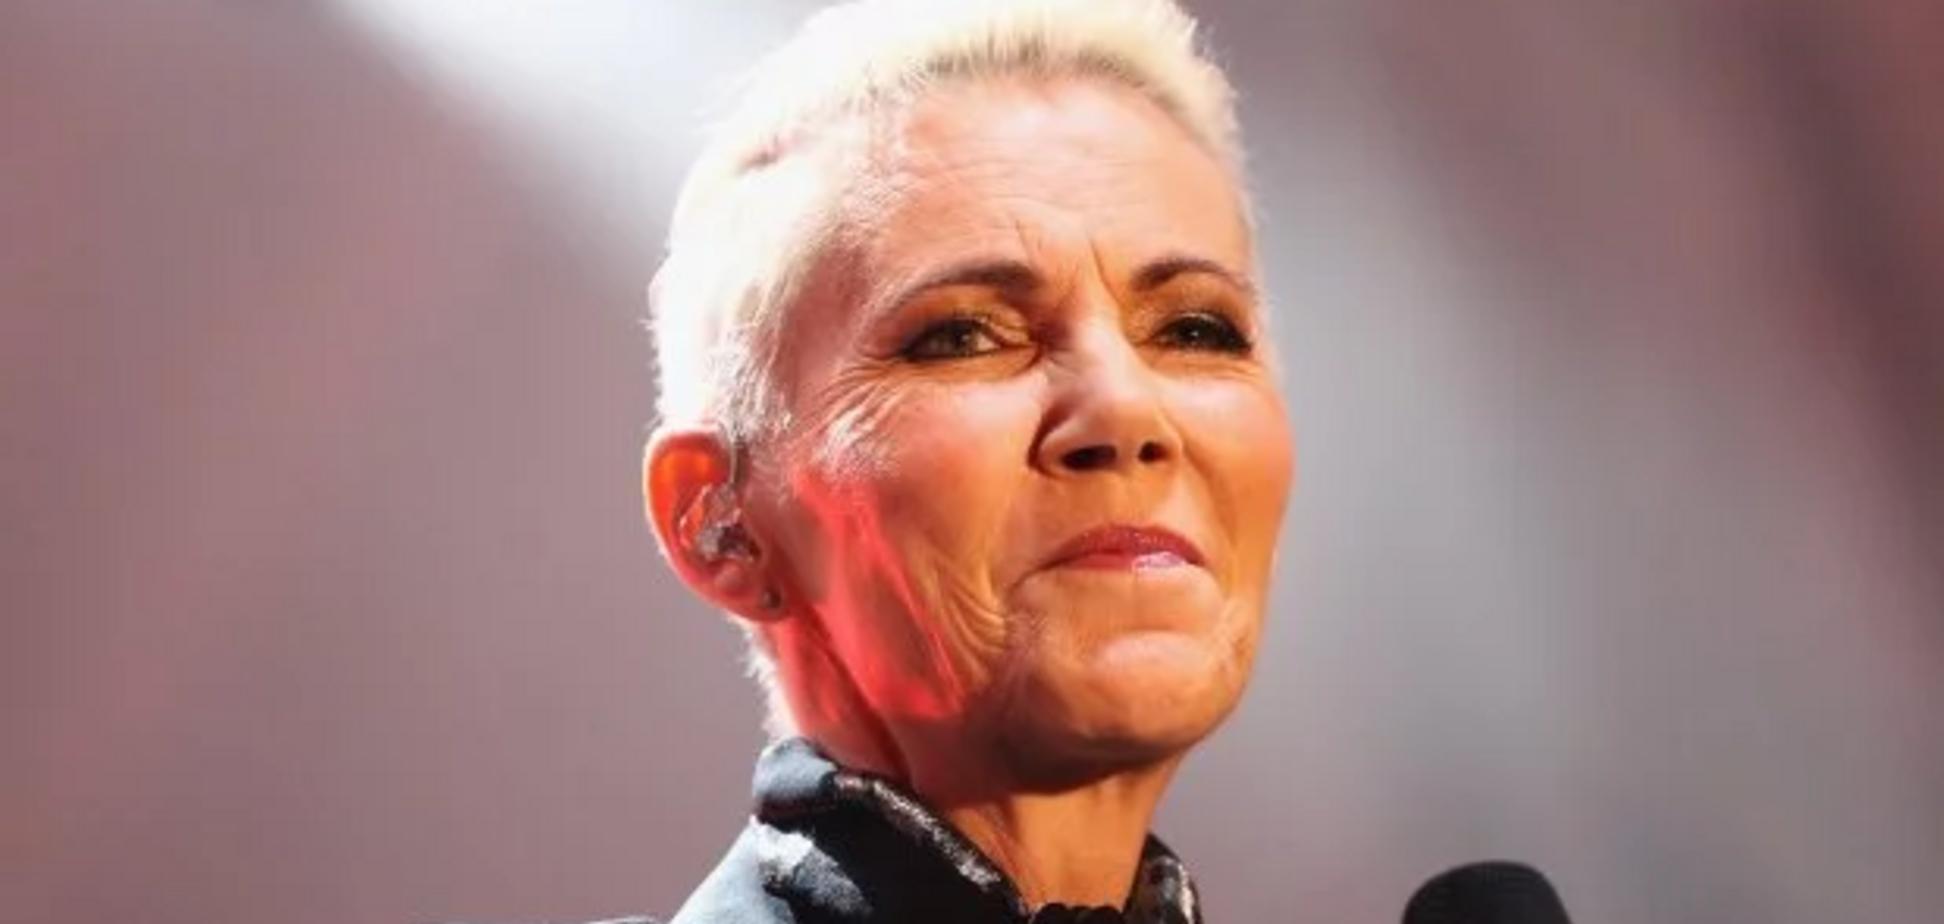 Легендарна солістка Roxette померла: на що вона хворіла